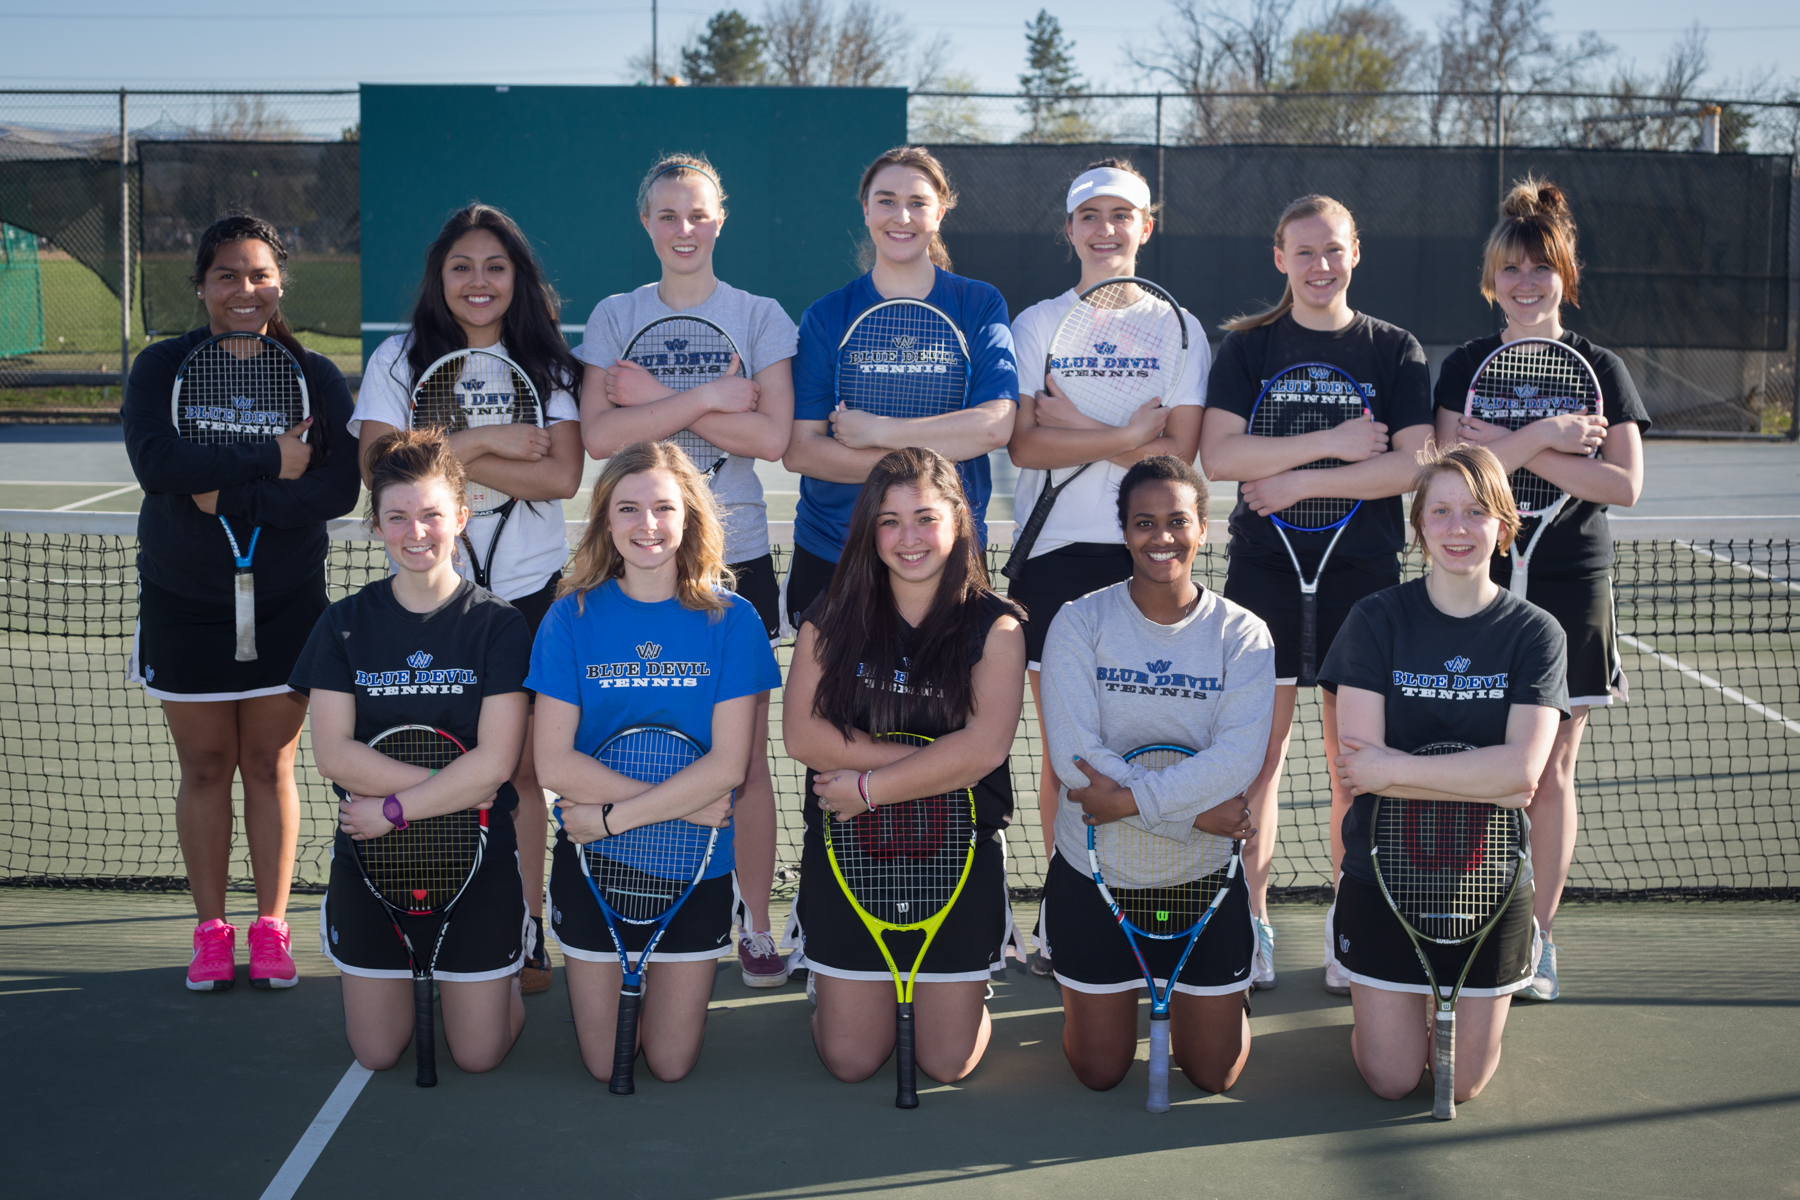 images/athletics/Tennis/2015-_Girls_Tennis-_Varsity.jpg